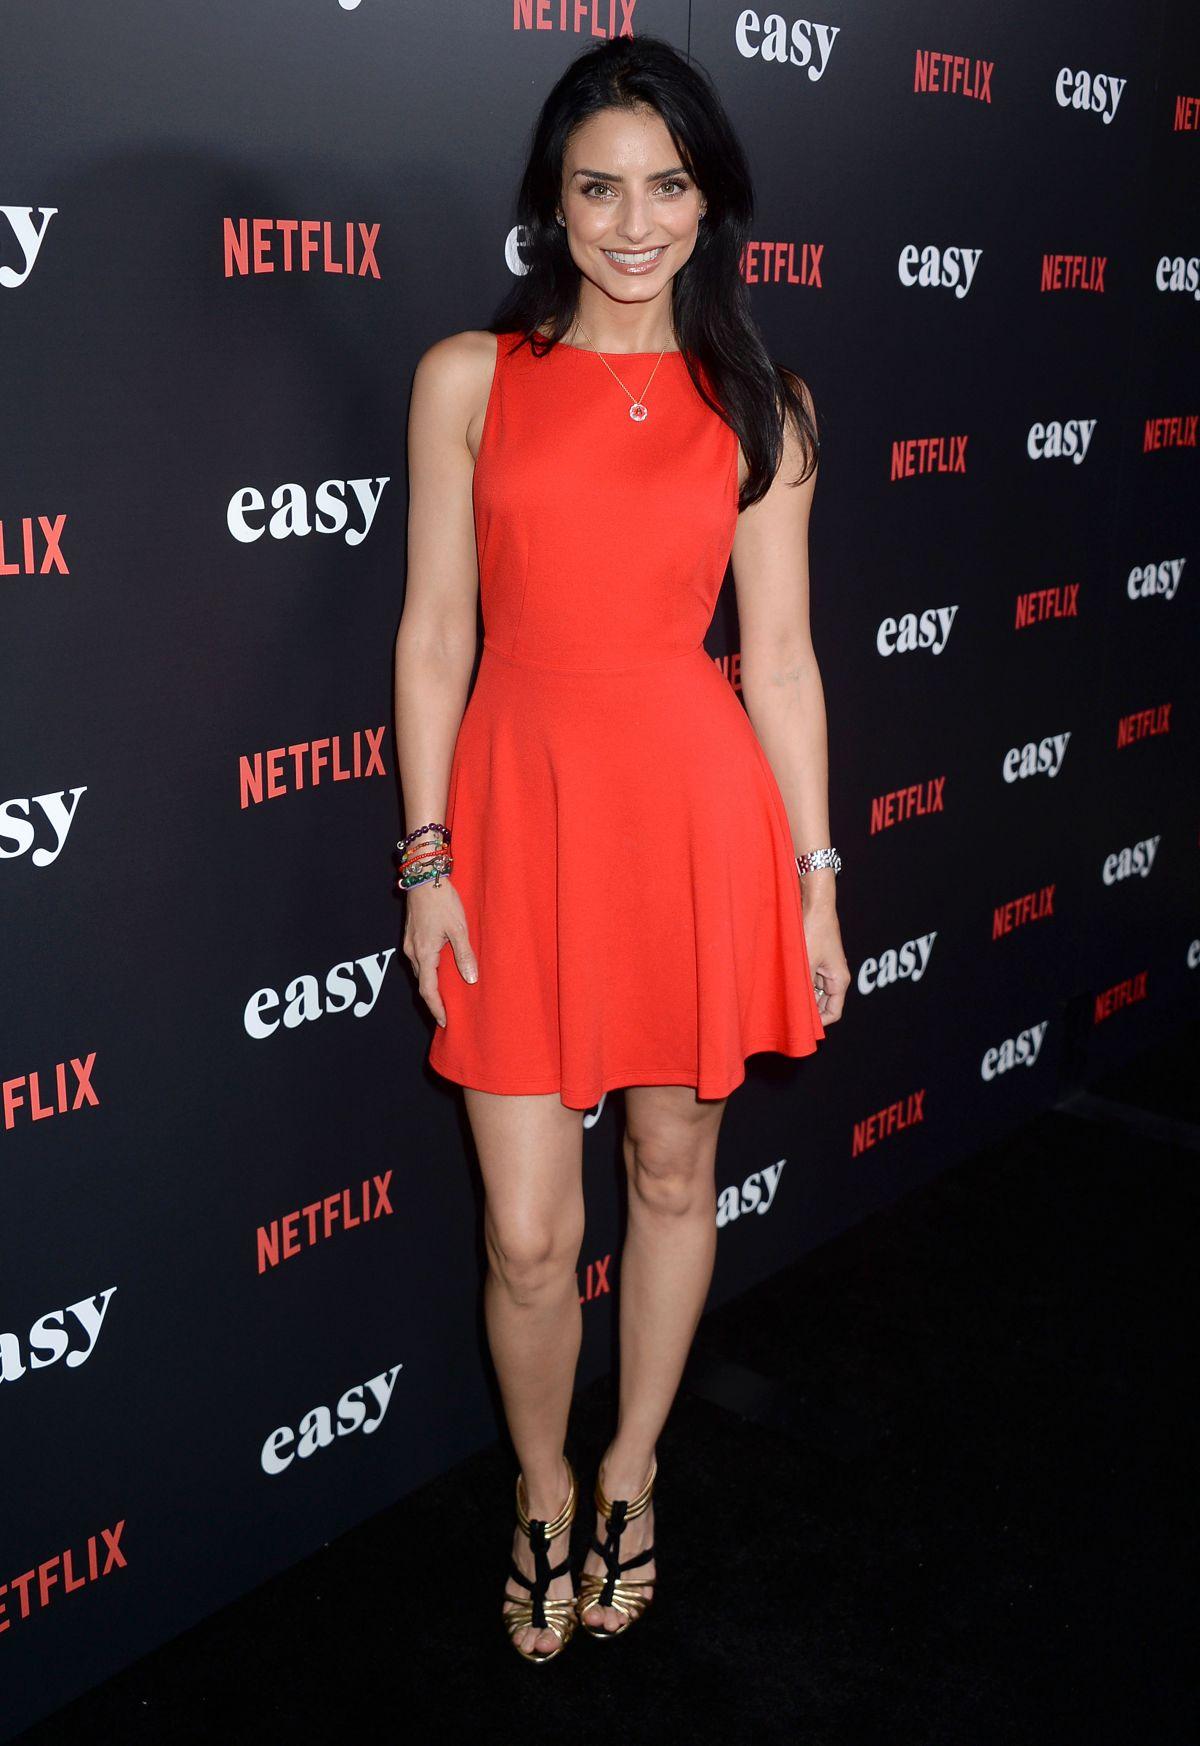 AISLINN DERBEZ at 'Easy' Premiere in West Hollywood 09/14 ...